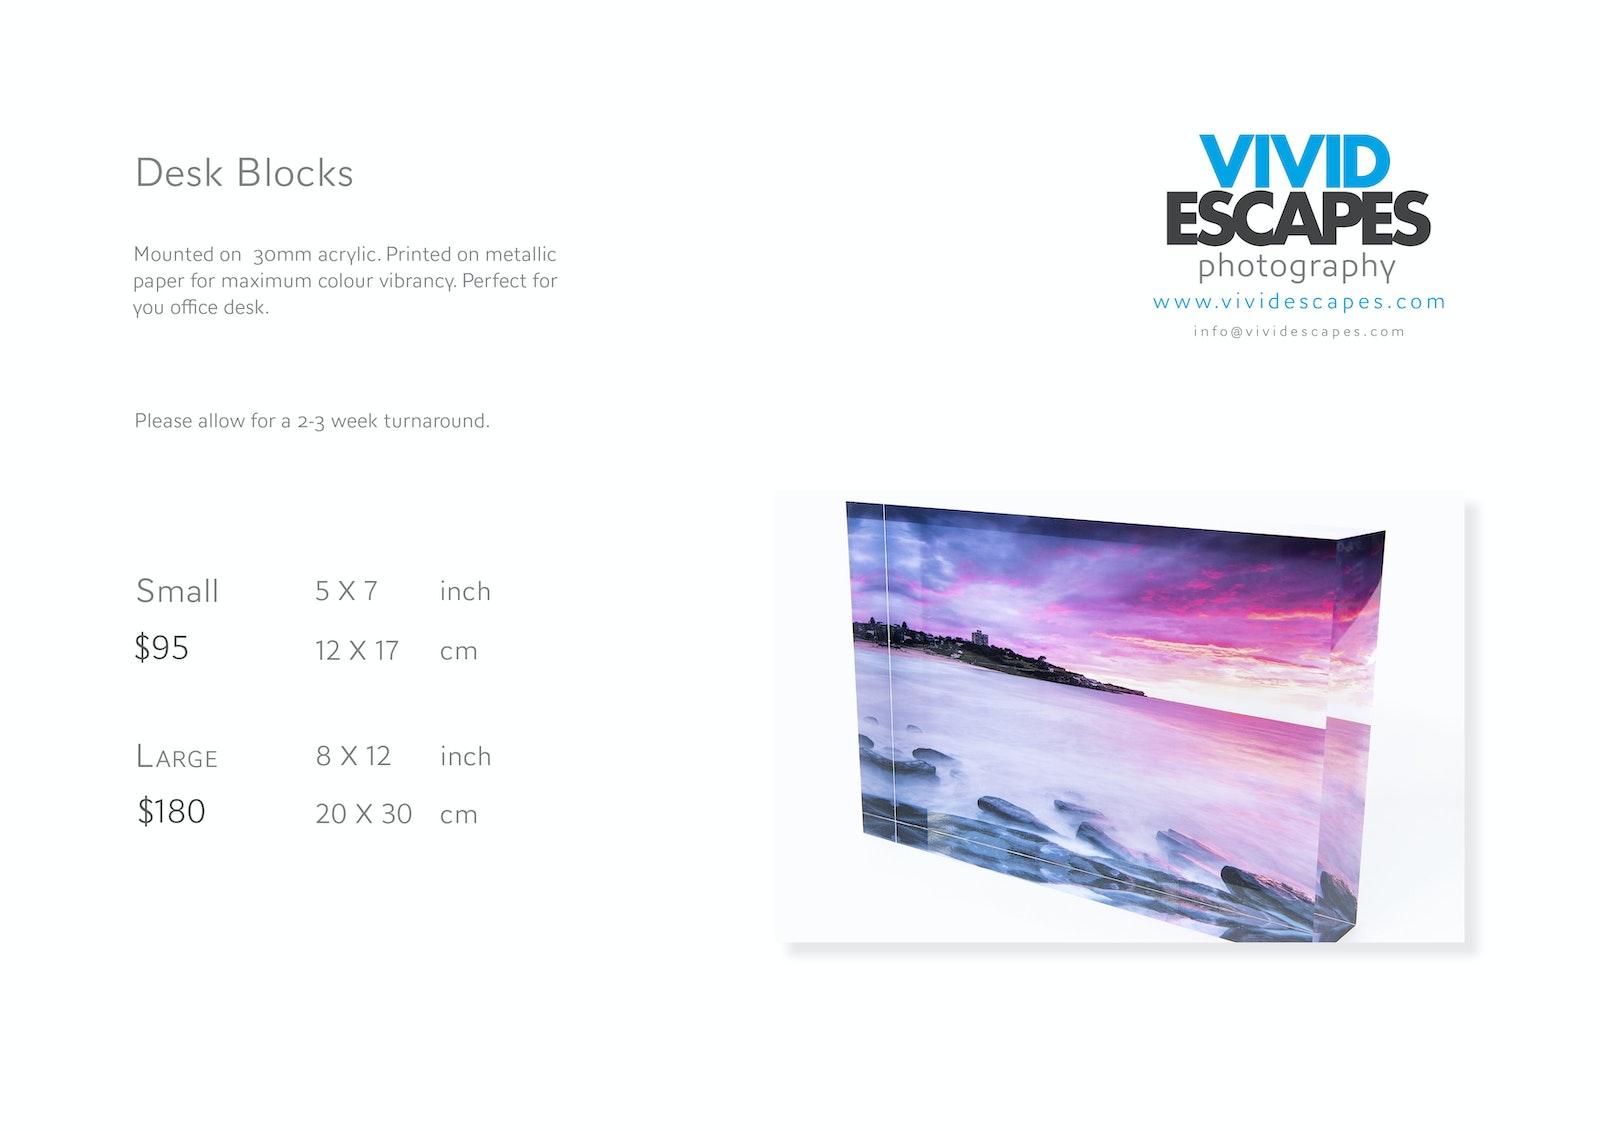 Vivid_Escapes_Price_List_NEW7